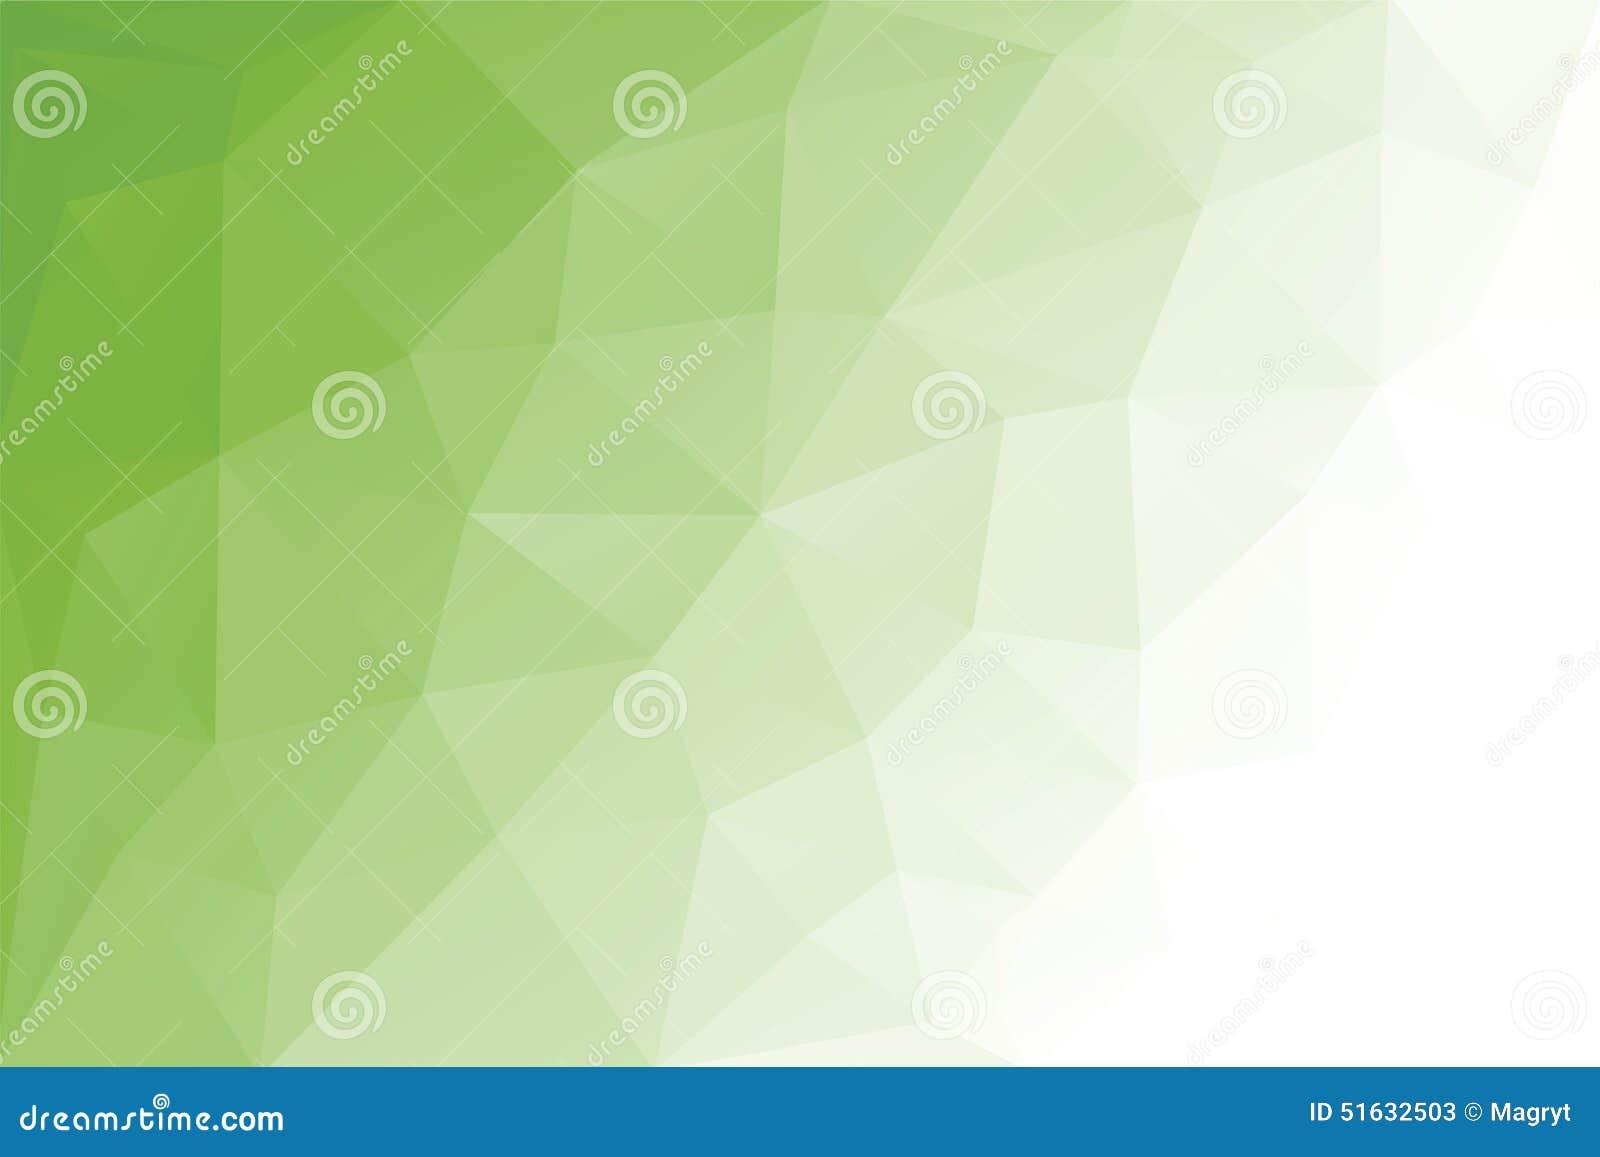 light green background design - photo #23